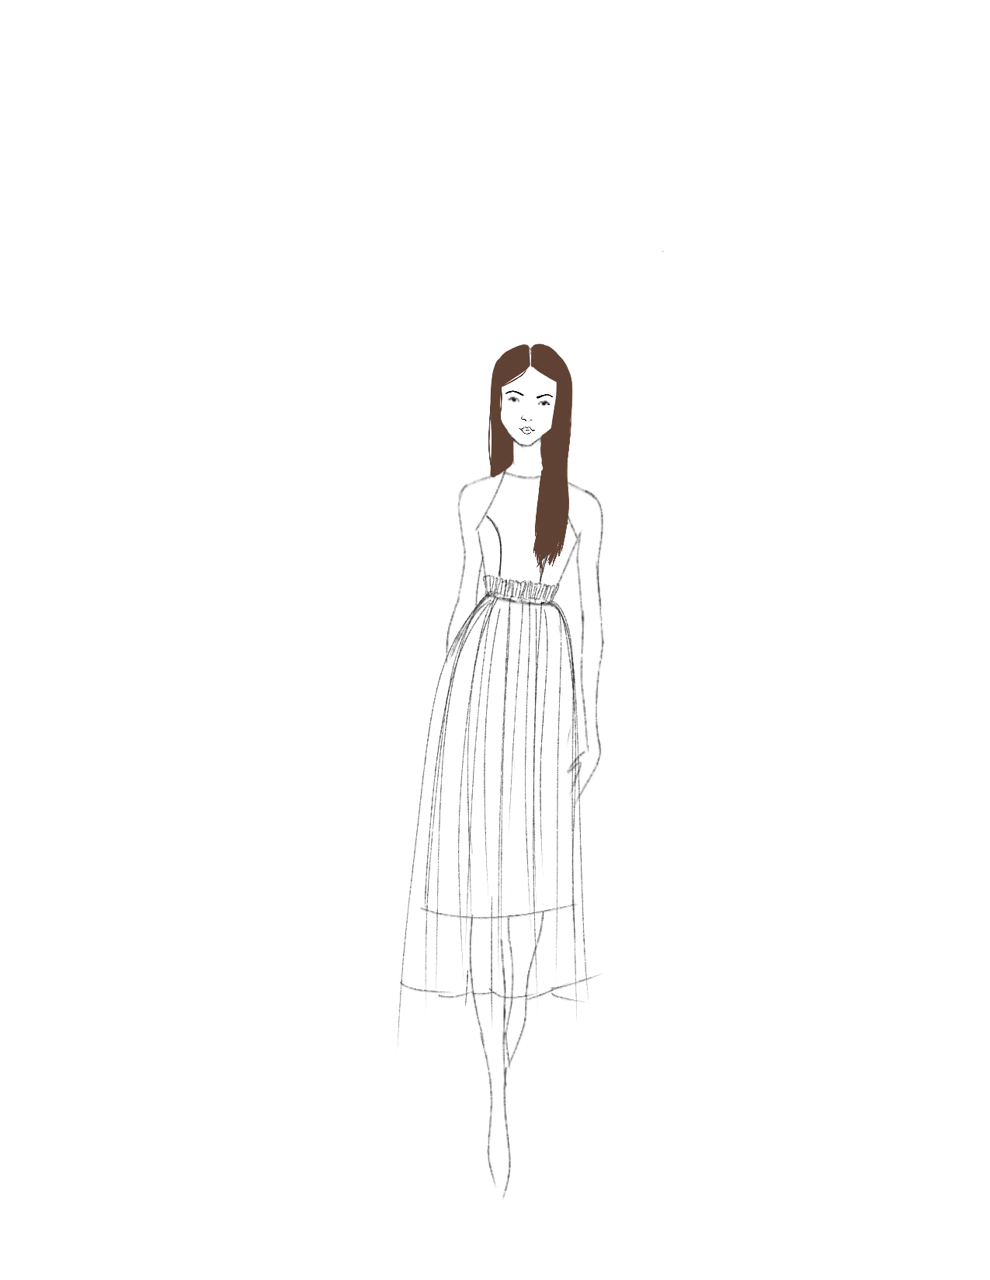 shadalene-design-janome-sketch.jpg